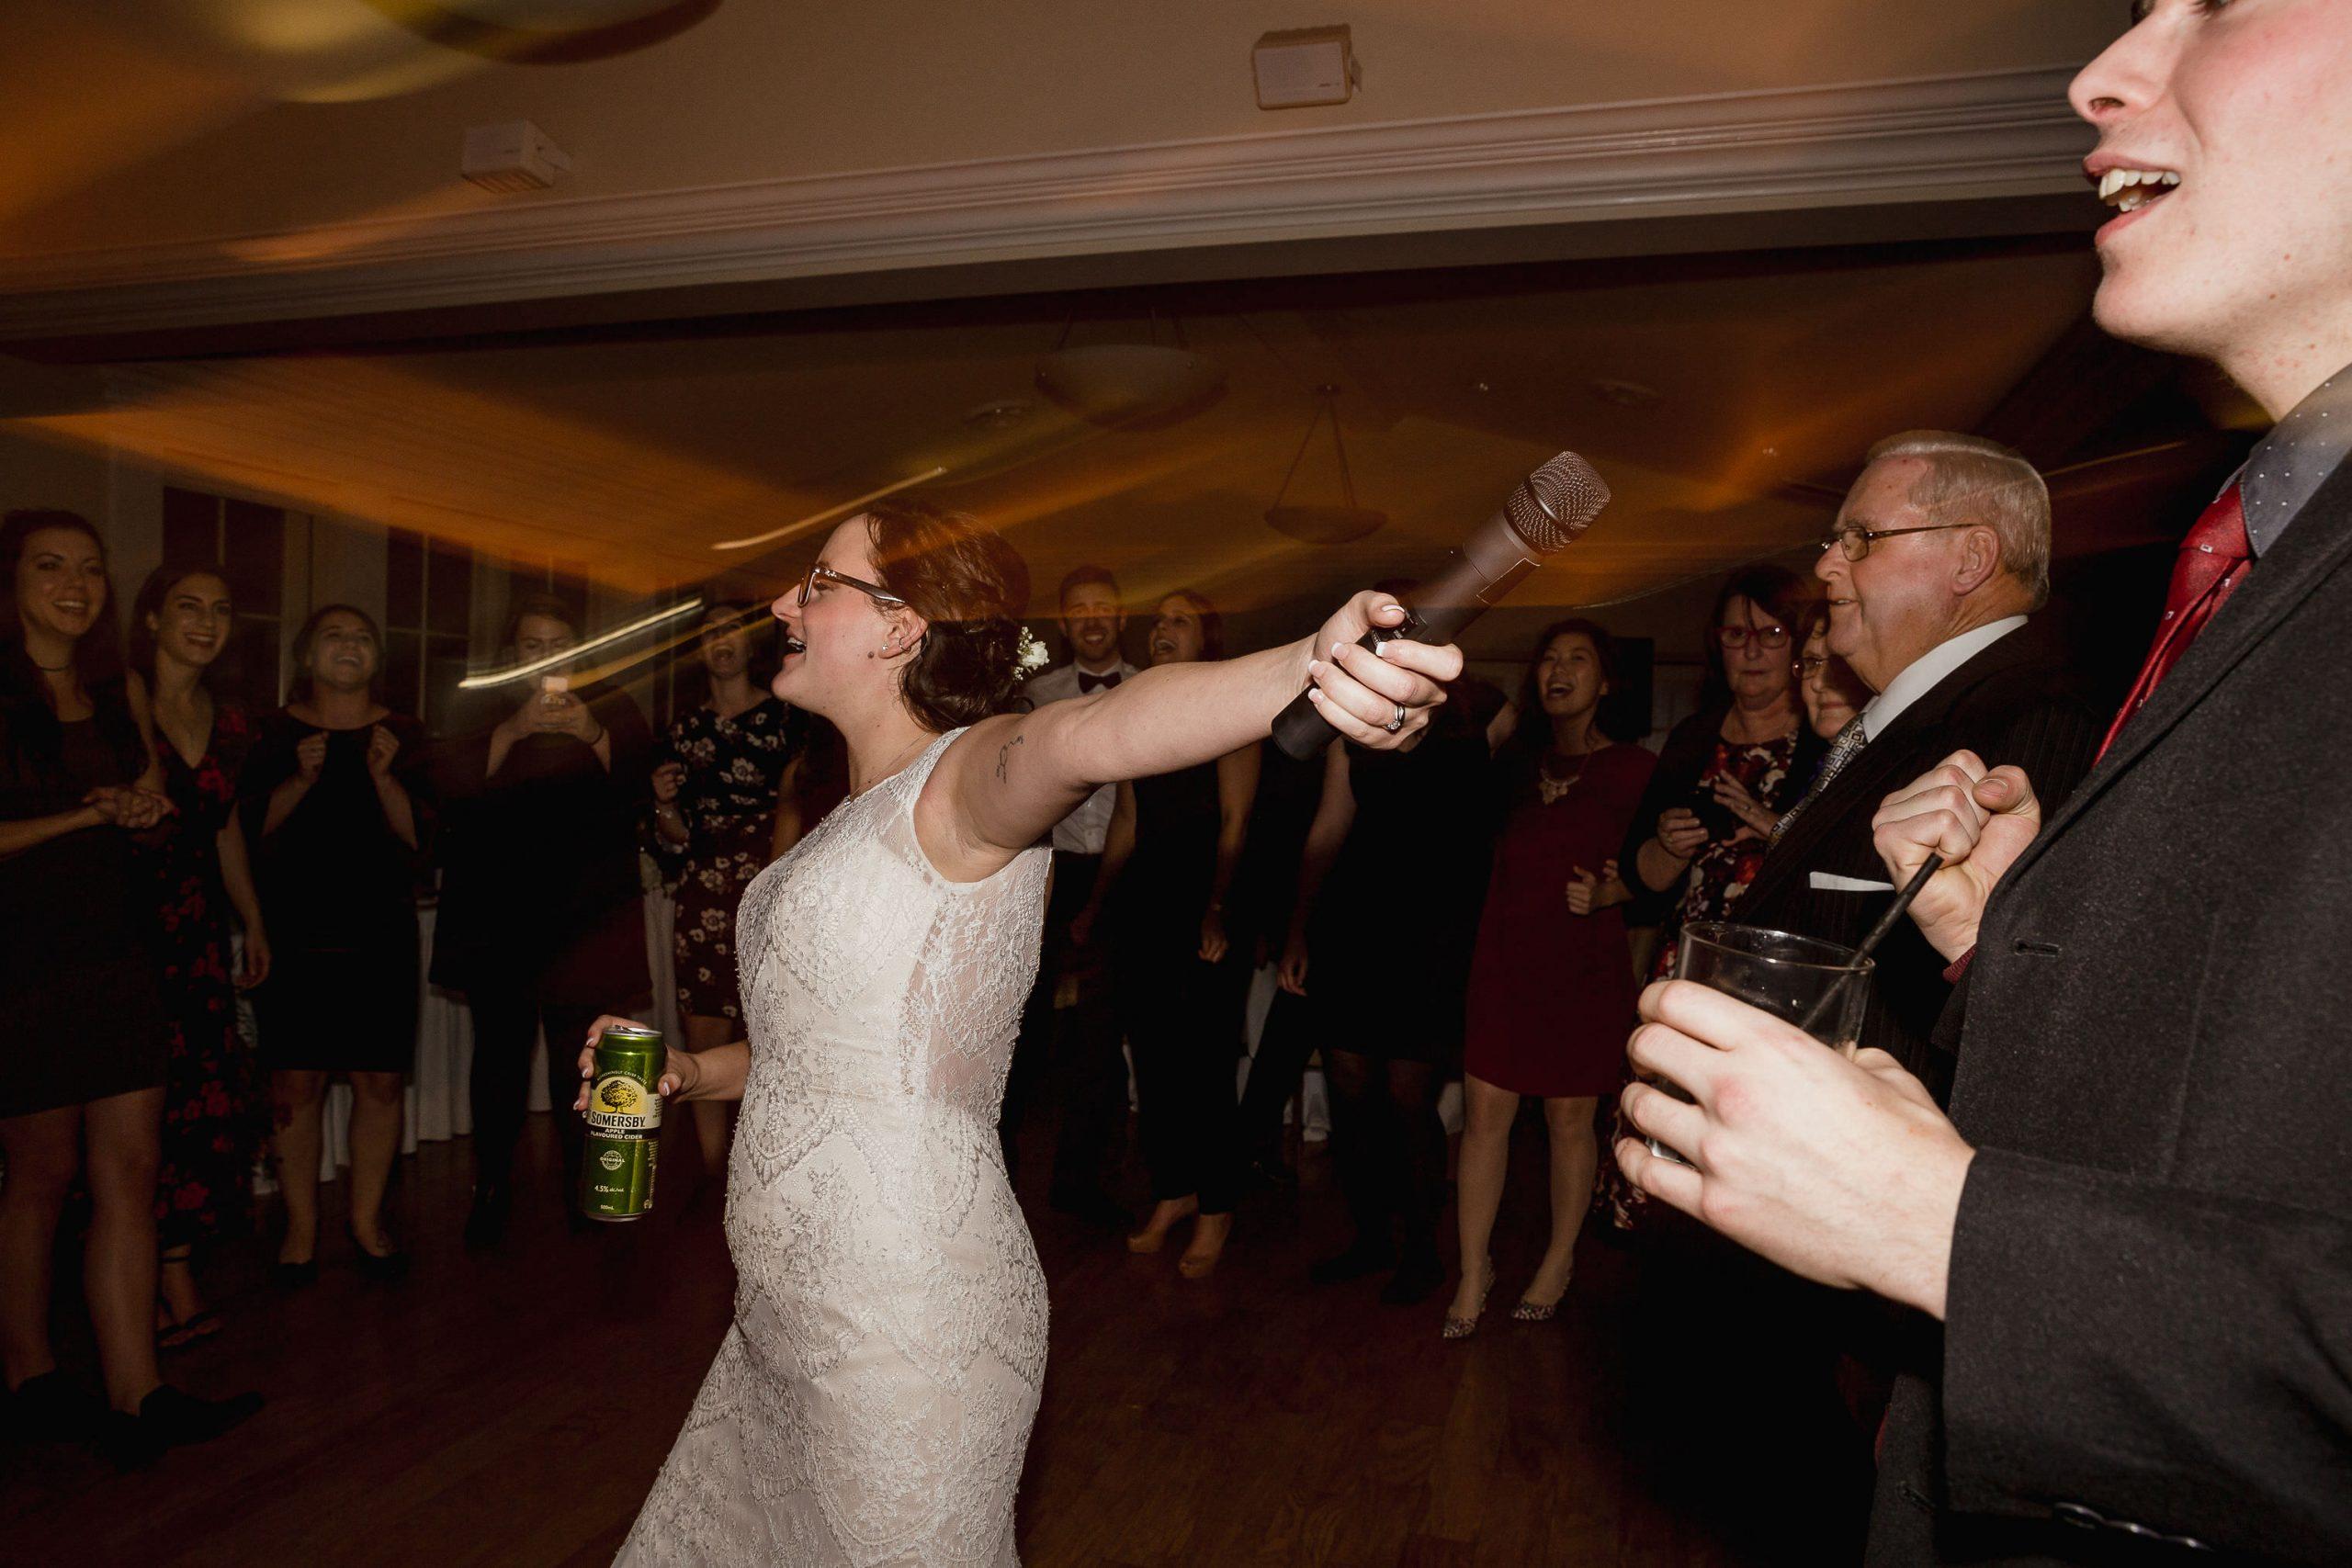 Wedding photo reception dance party light